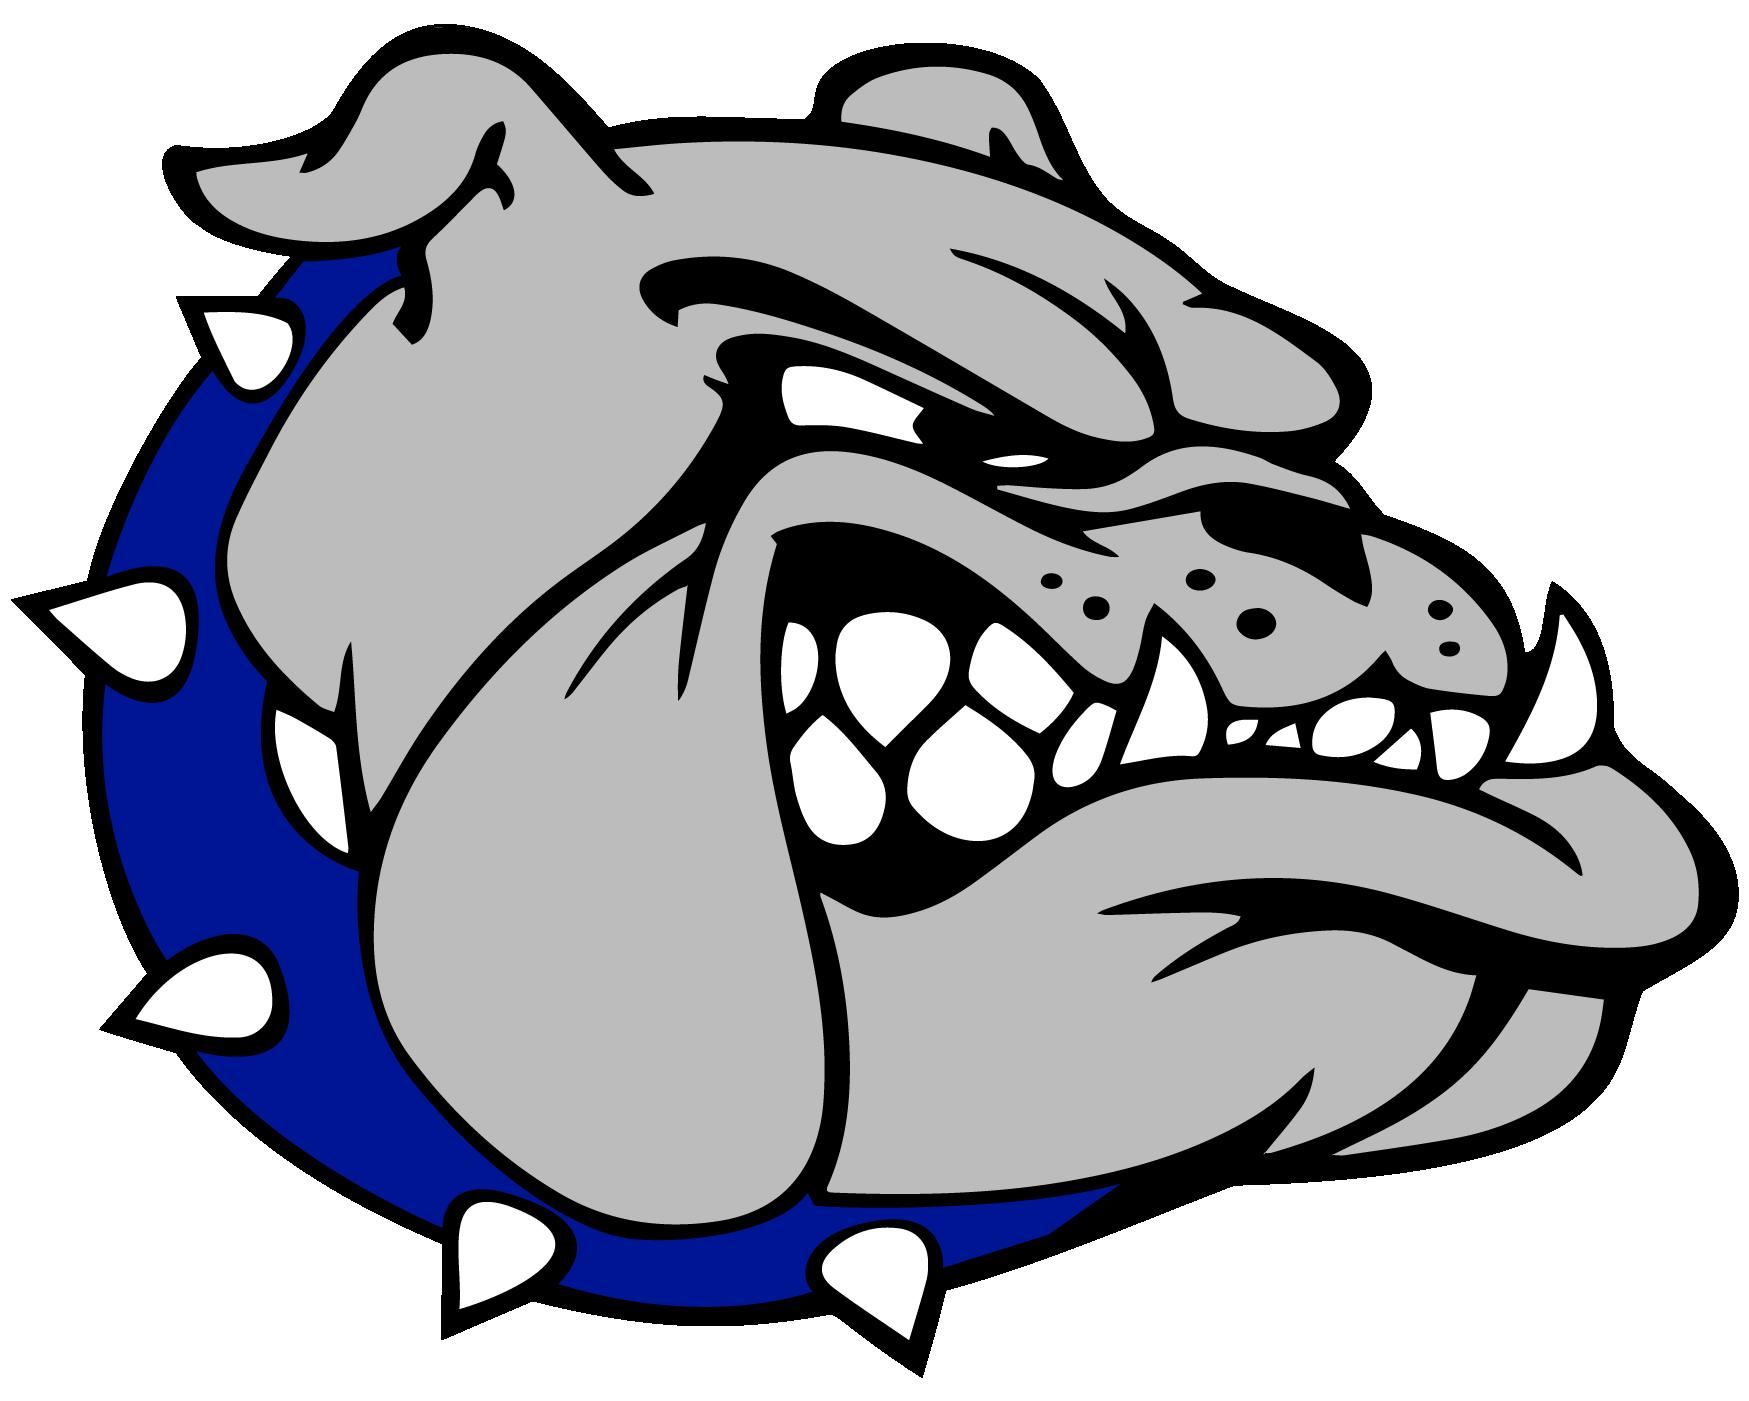 1581361294-logo